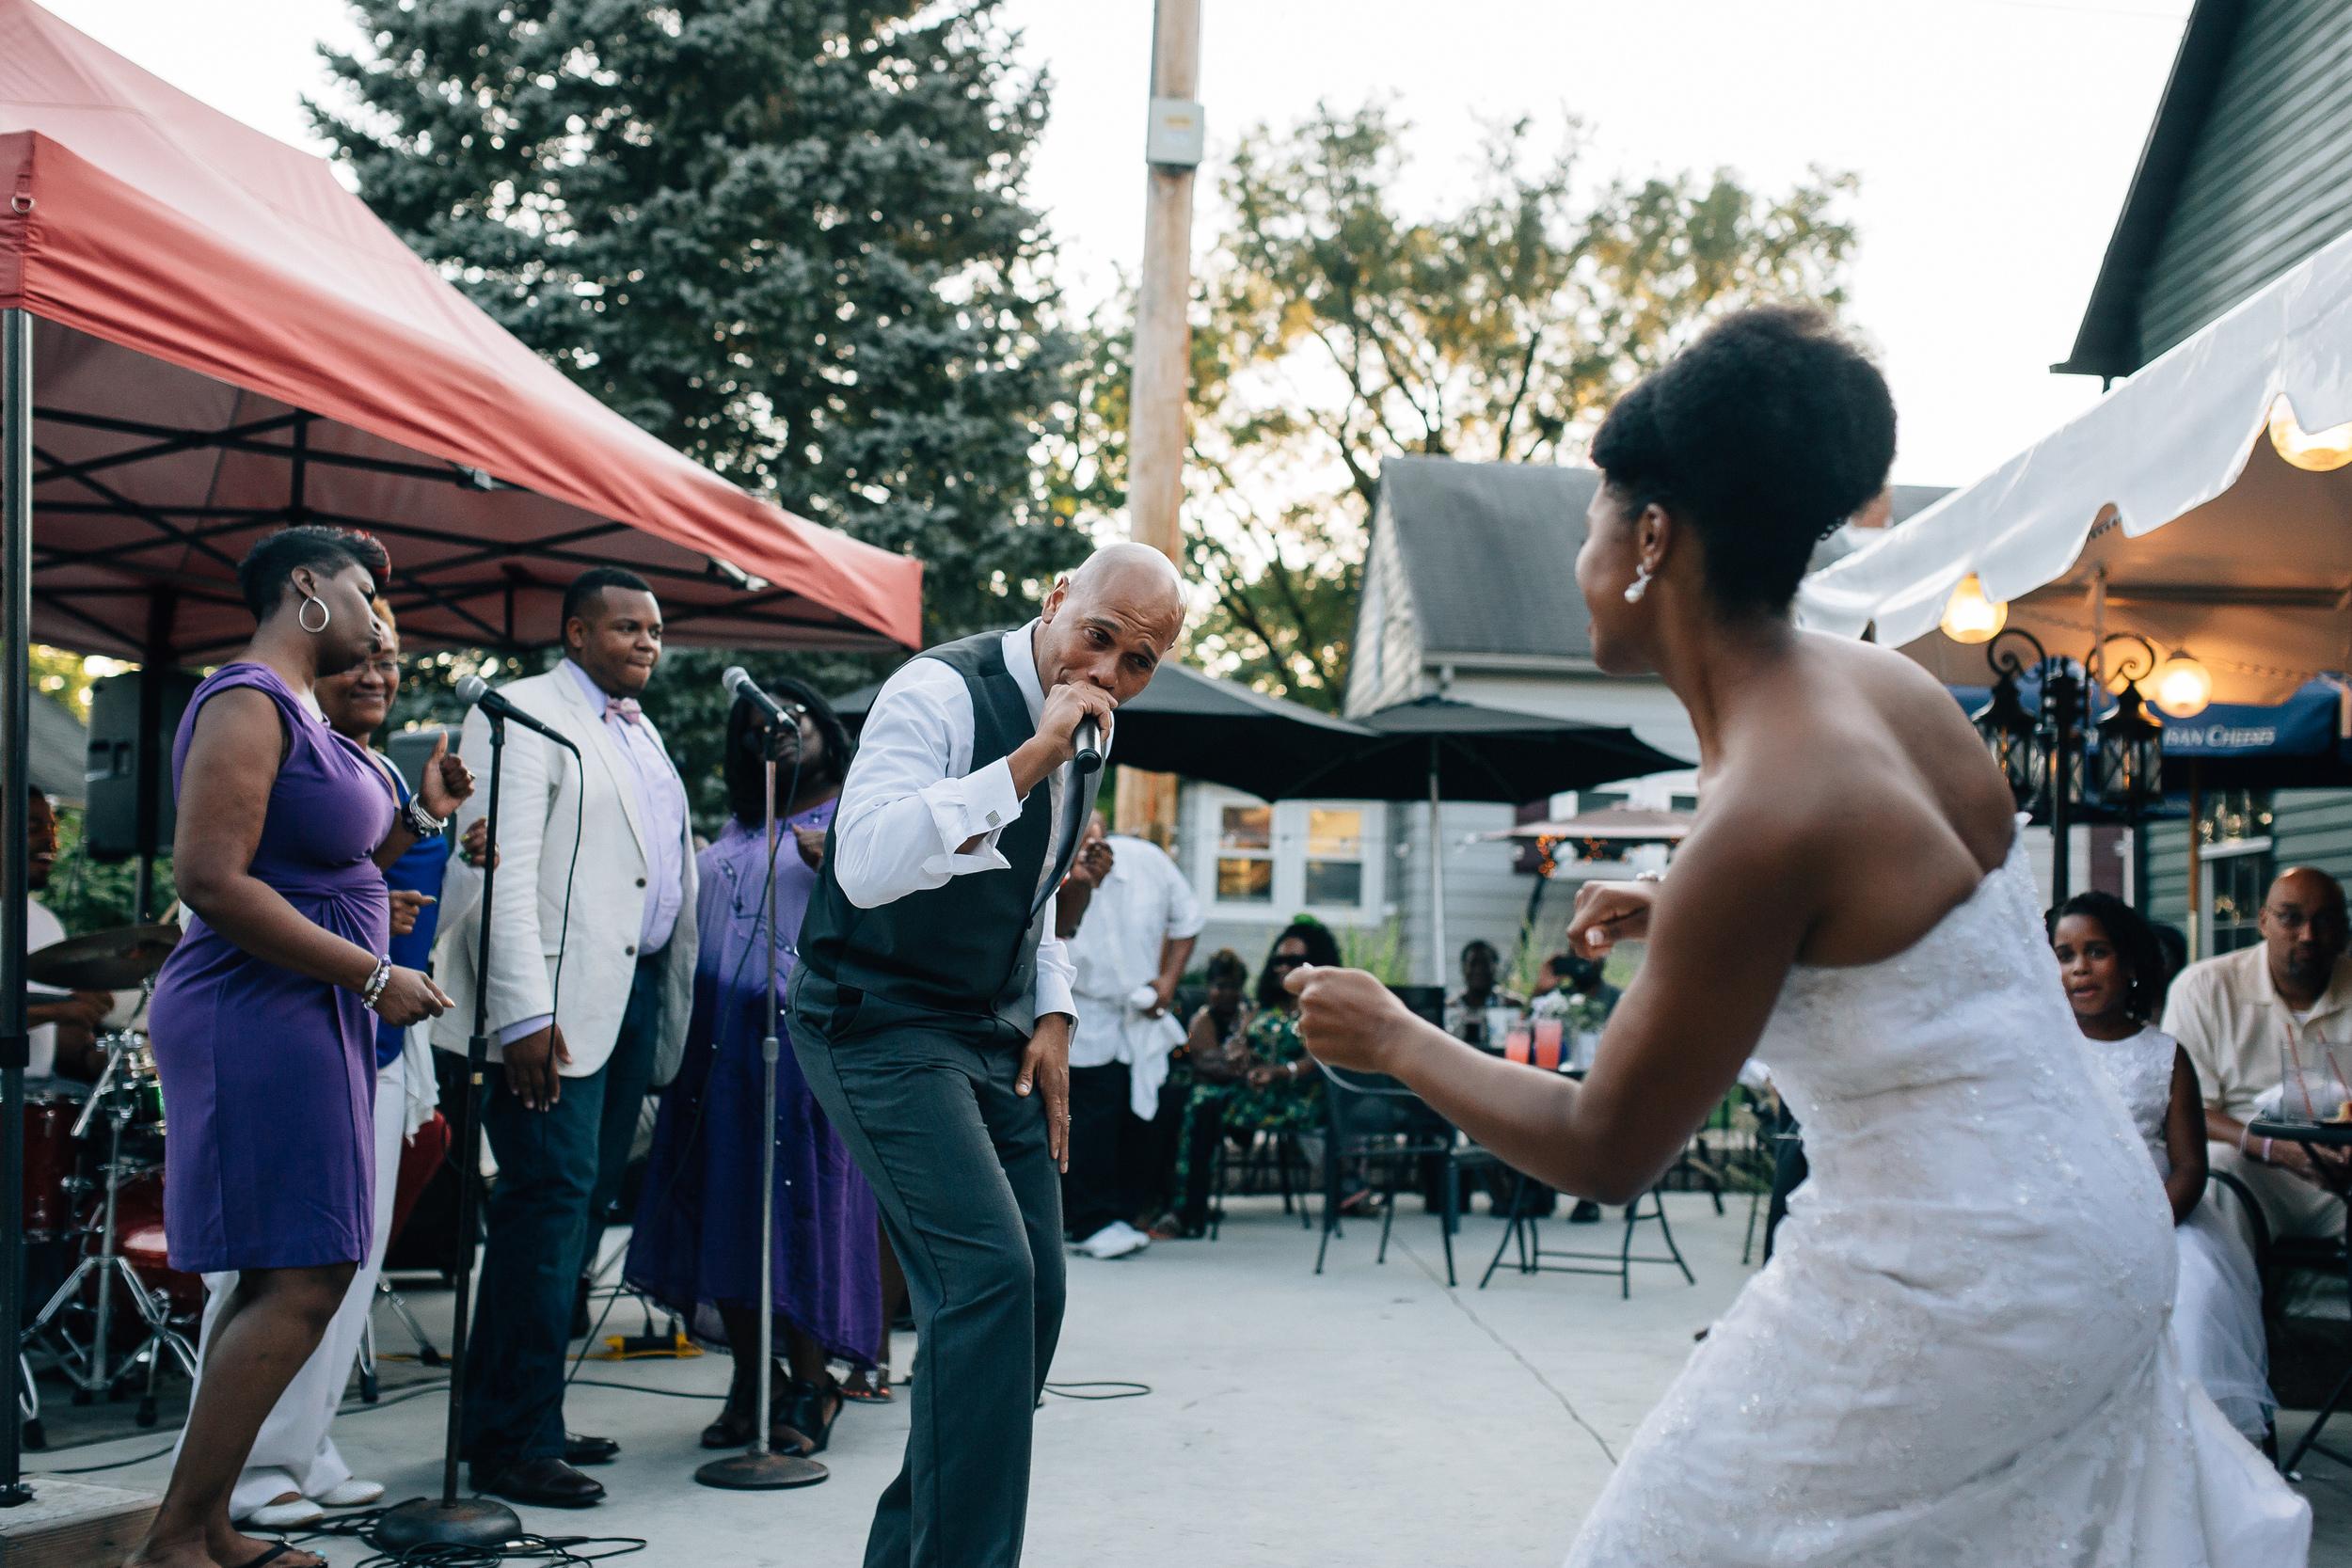 Chuck & Alicia's Wedding - Corrie Mick Photography-608.jpg